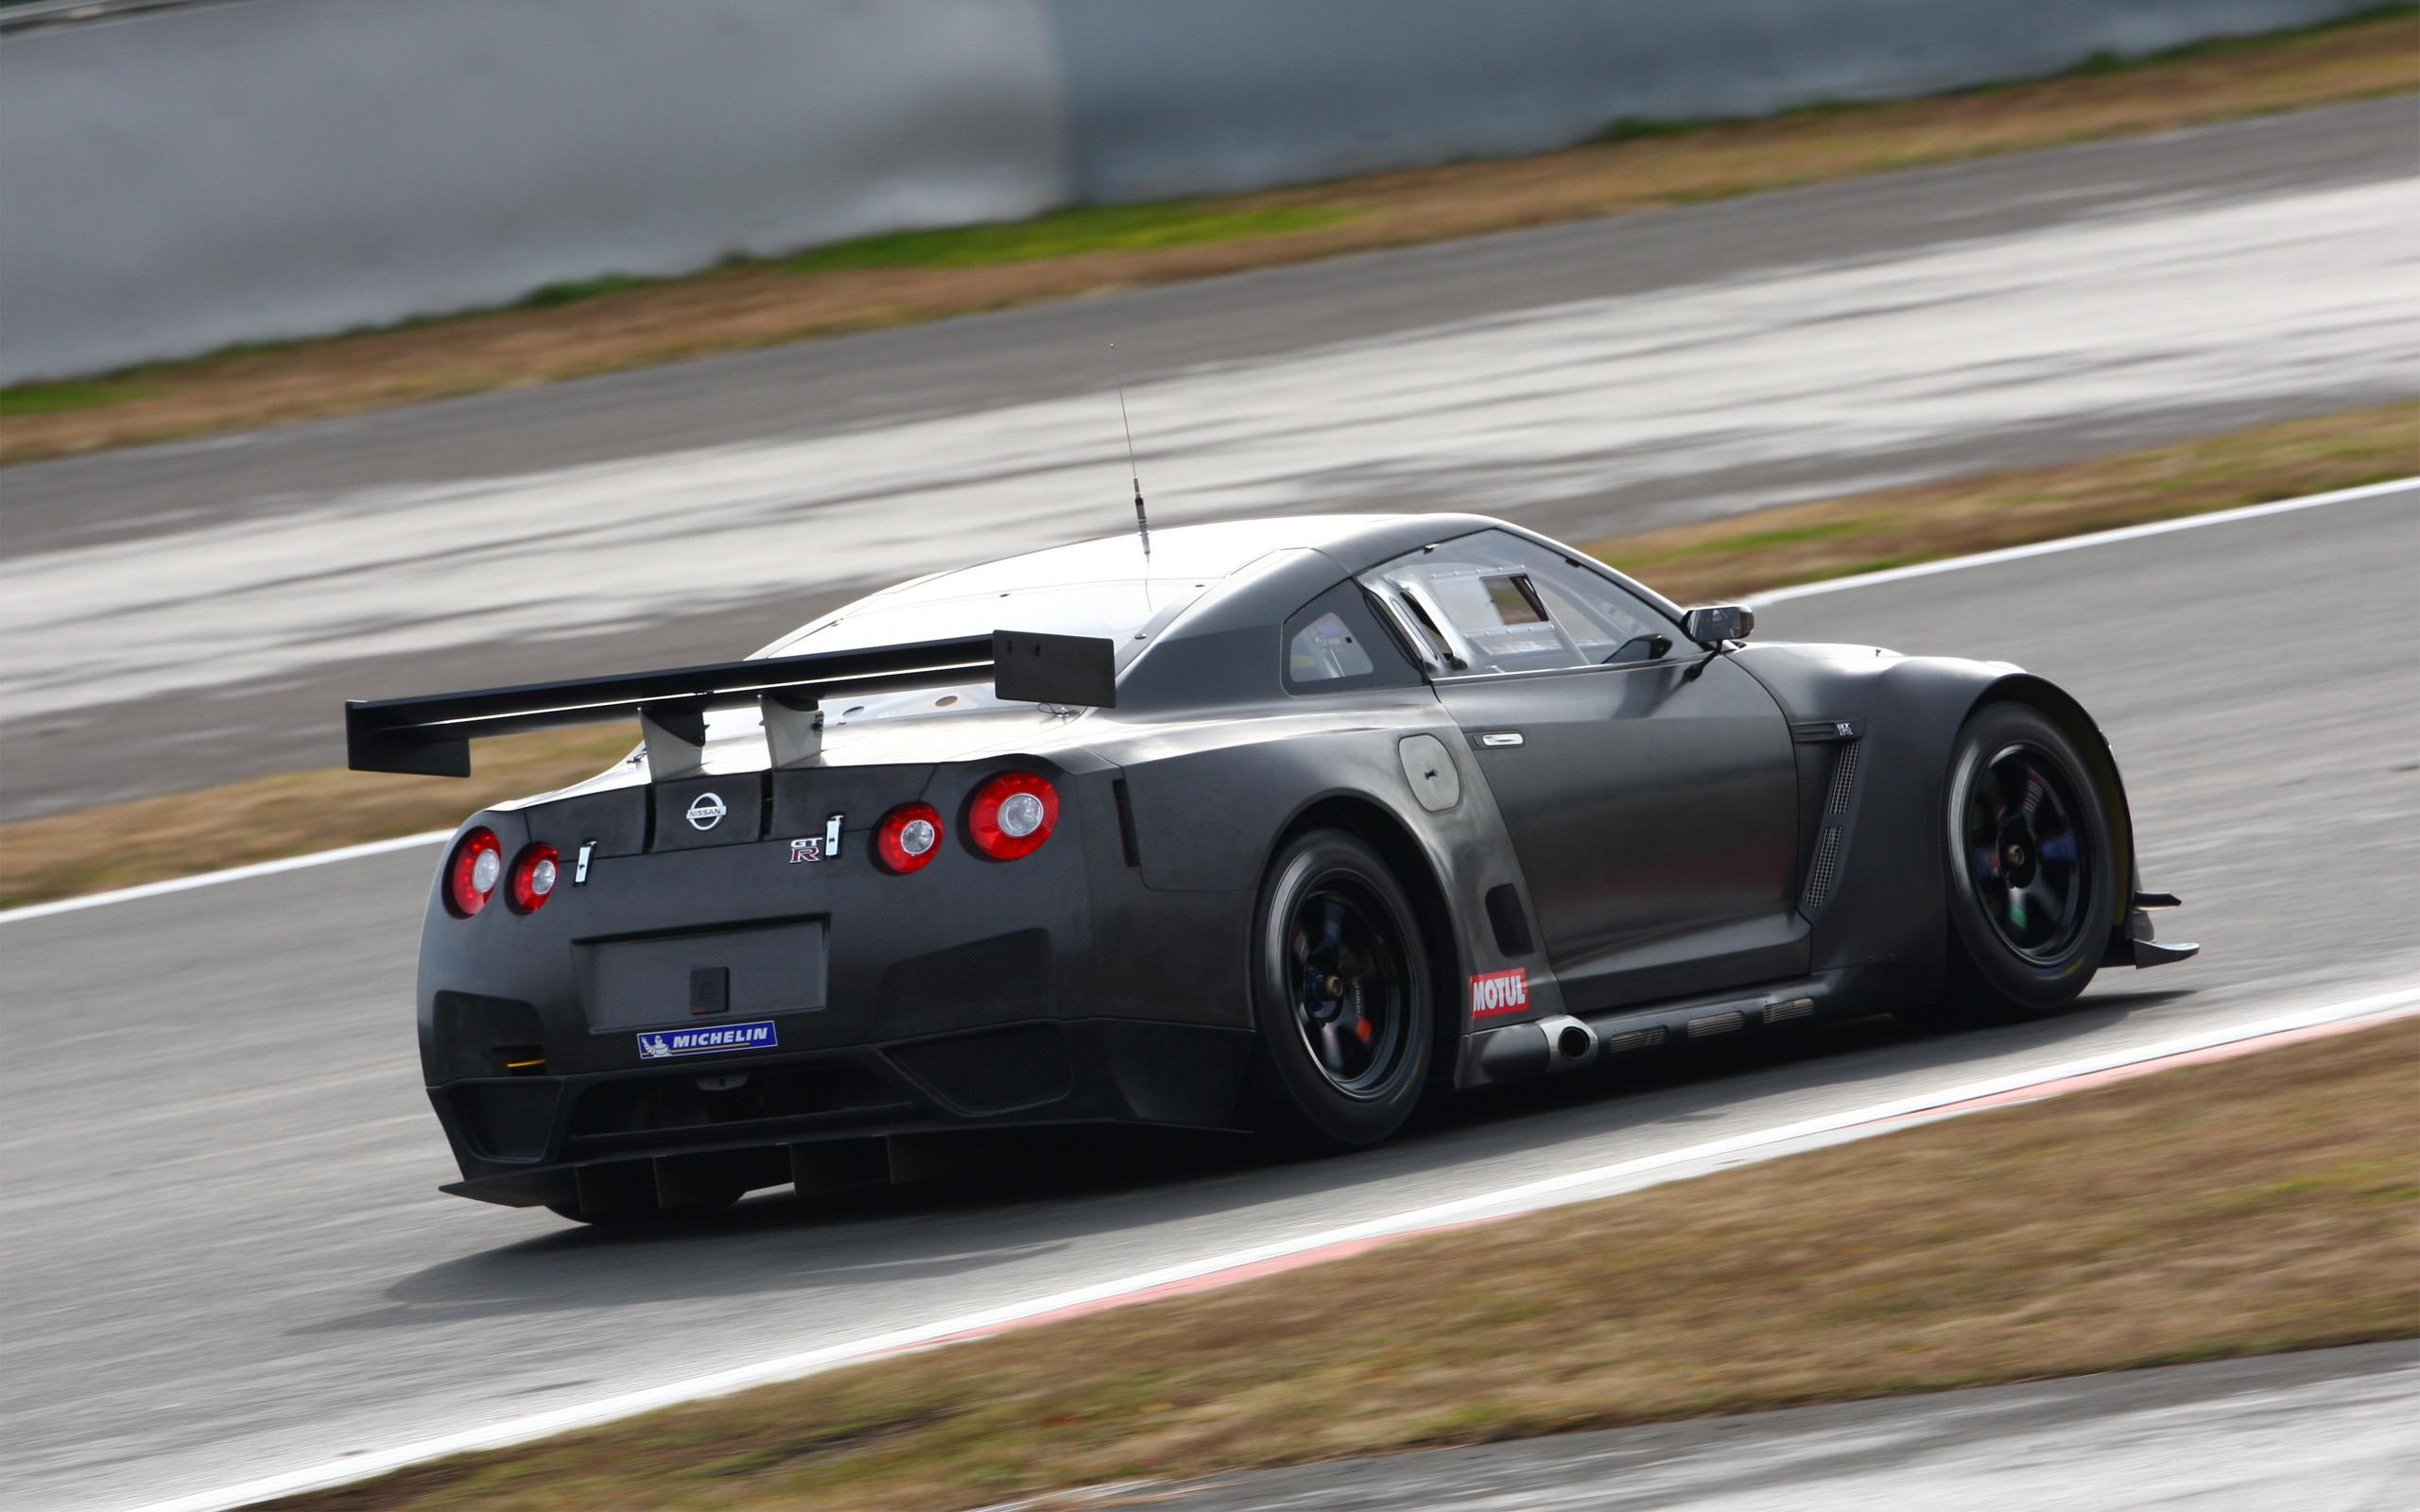 Black Nissan Gtr Wallpapers Images Download Nissan Skyline Black Gtr Nismo 2560x1600 Wallpaper Teahub Io